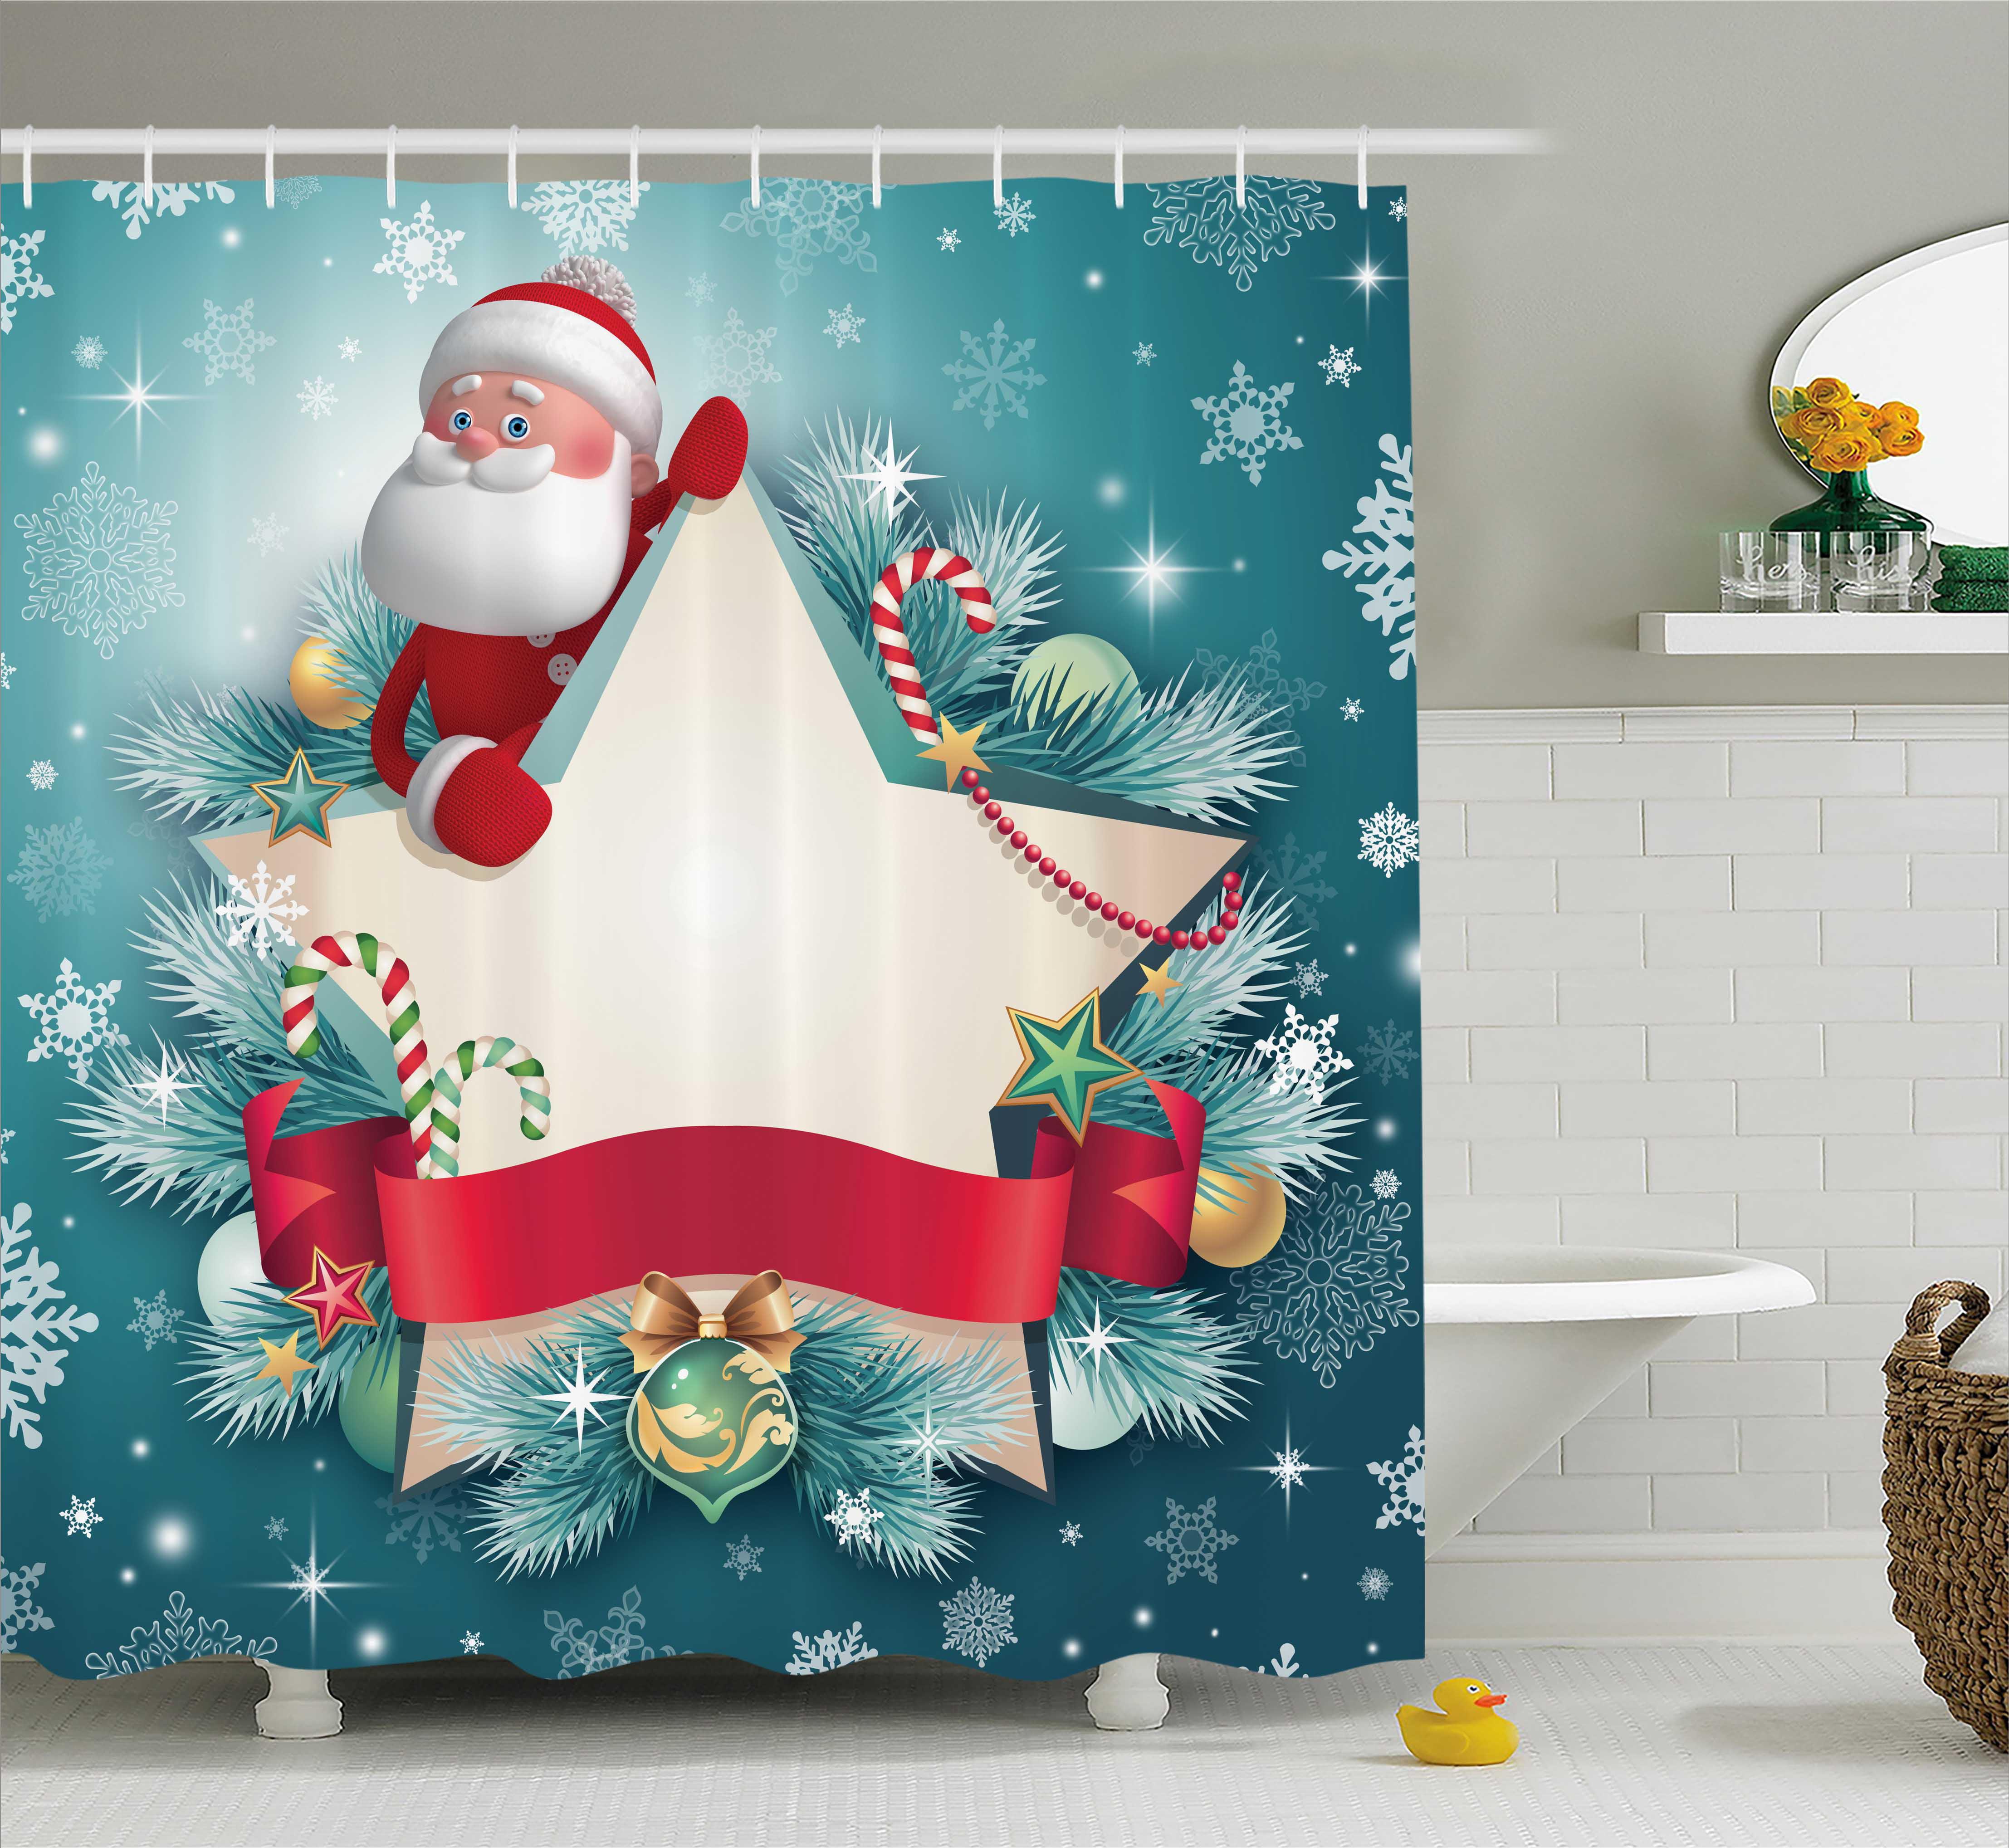 Xmas Tree Window Snowflake Santa Bathroom Shower Curtain Set Waterproof Fabric